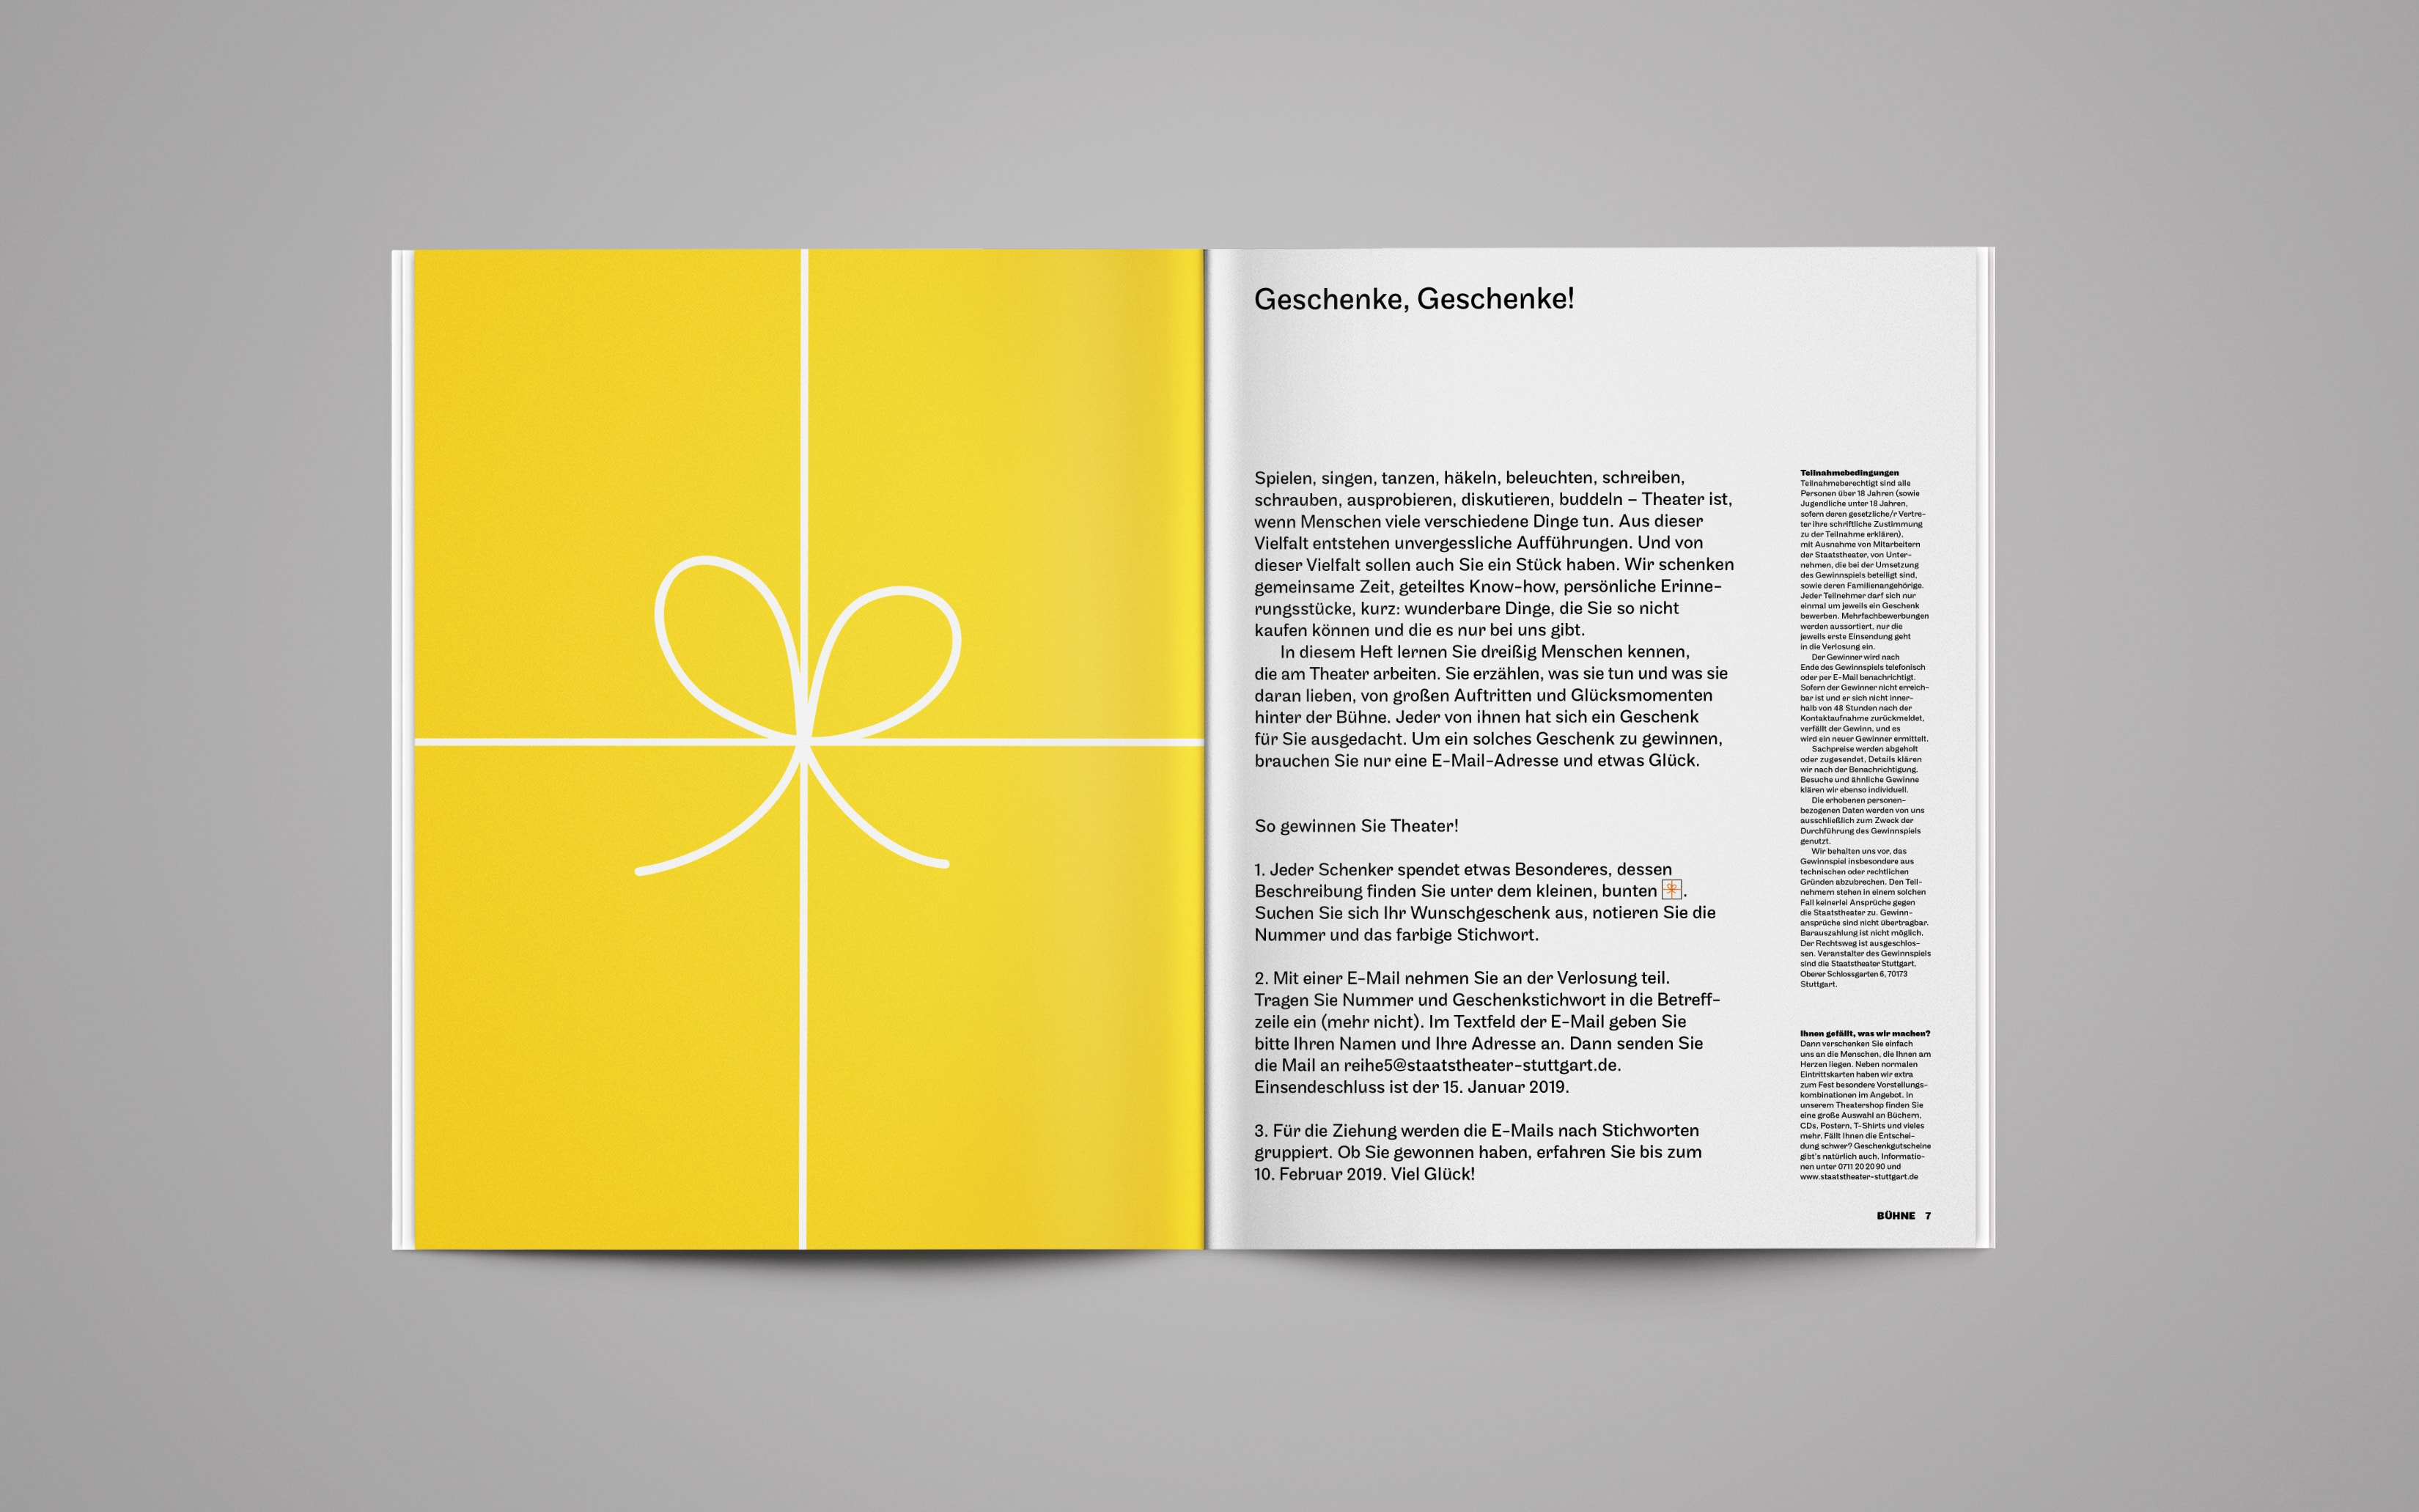 Bureau Johannes Erler – Geschenke, Geschenke!